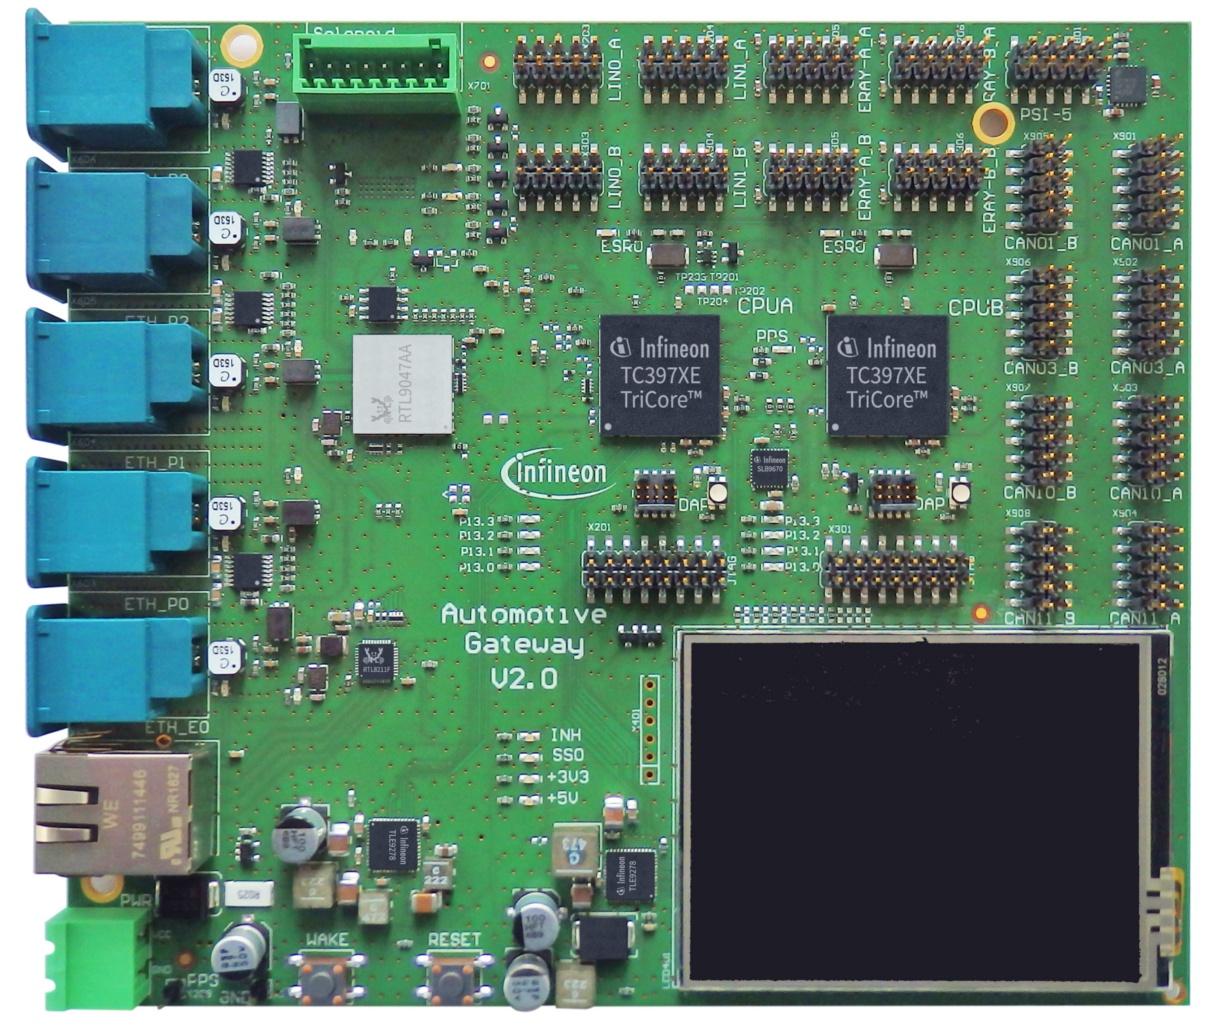 KIT_A2G_TC397_GTW - Infineon Technologies